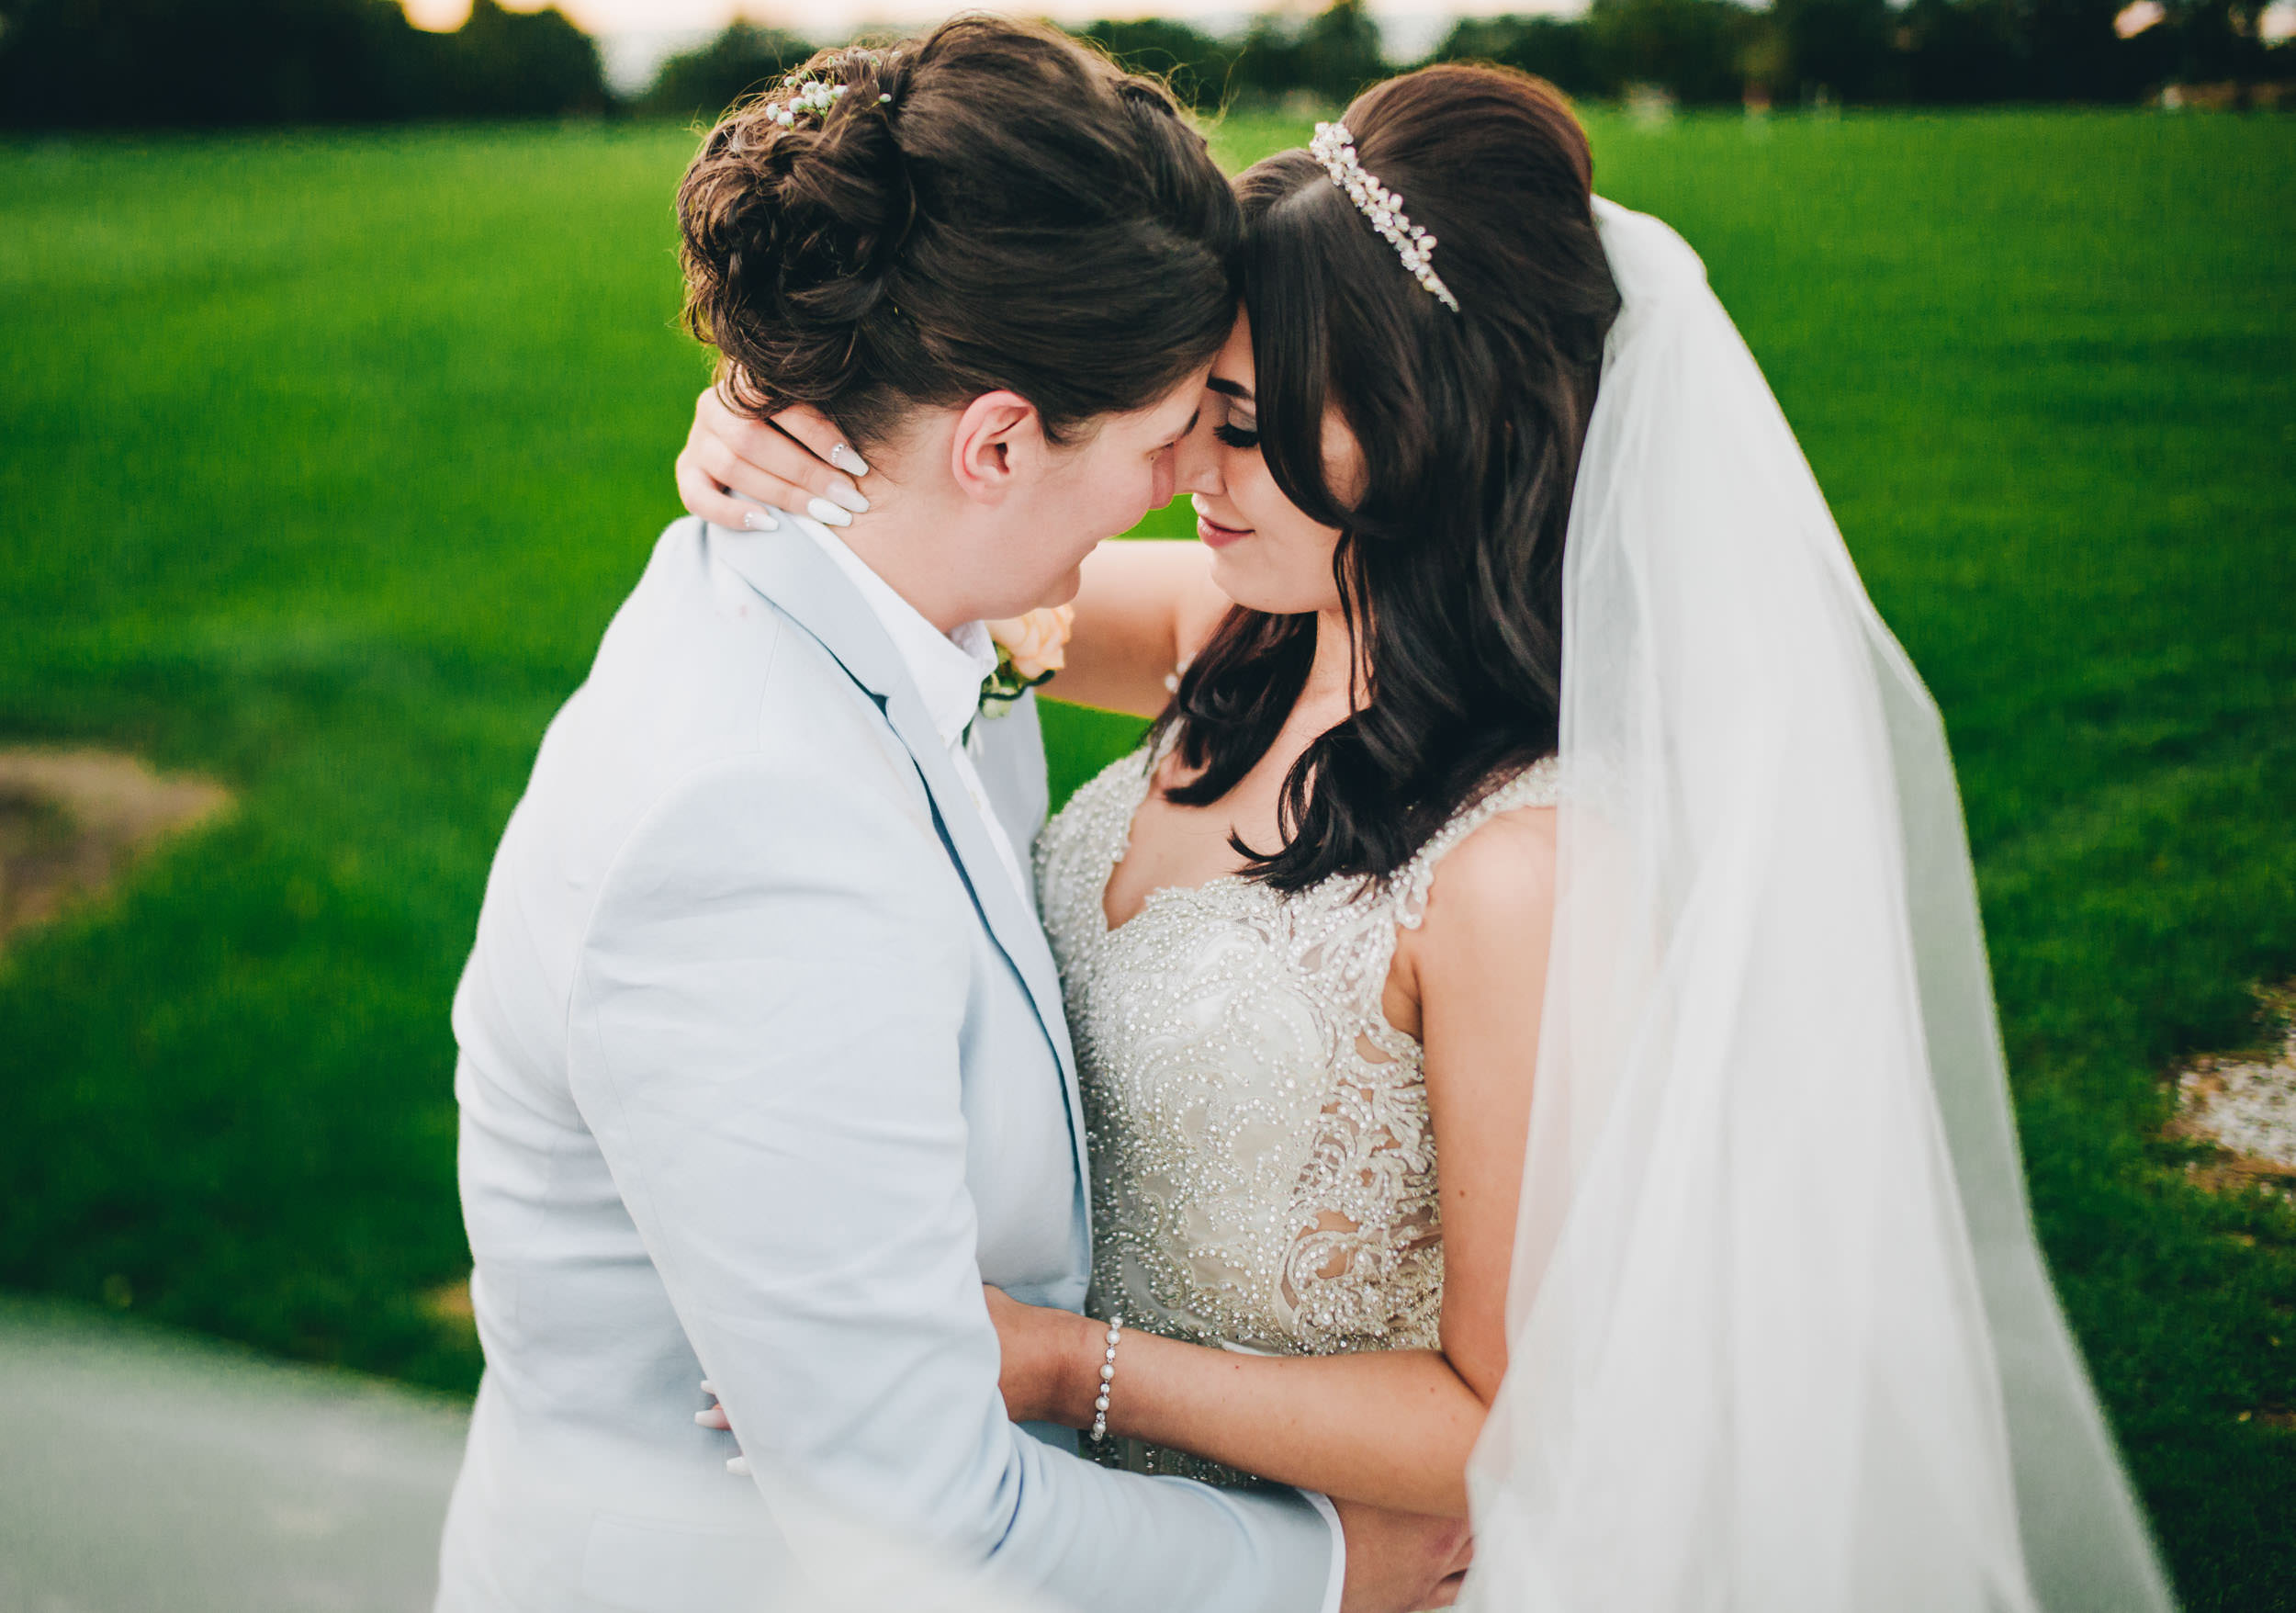 Cheshire wedding photographer - evening portraits